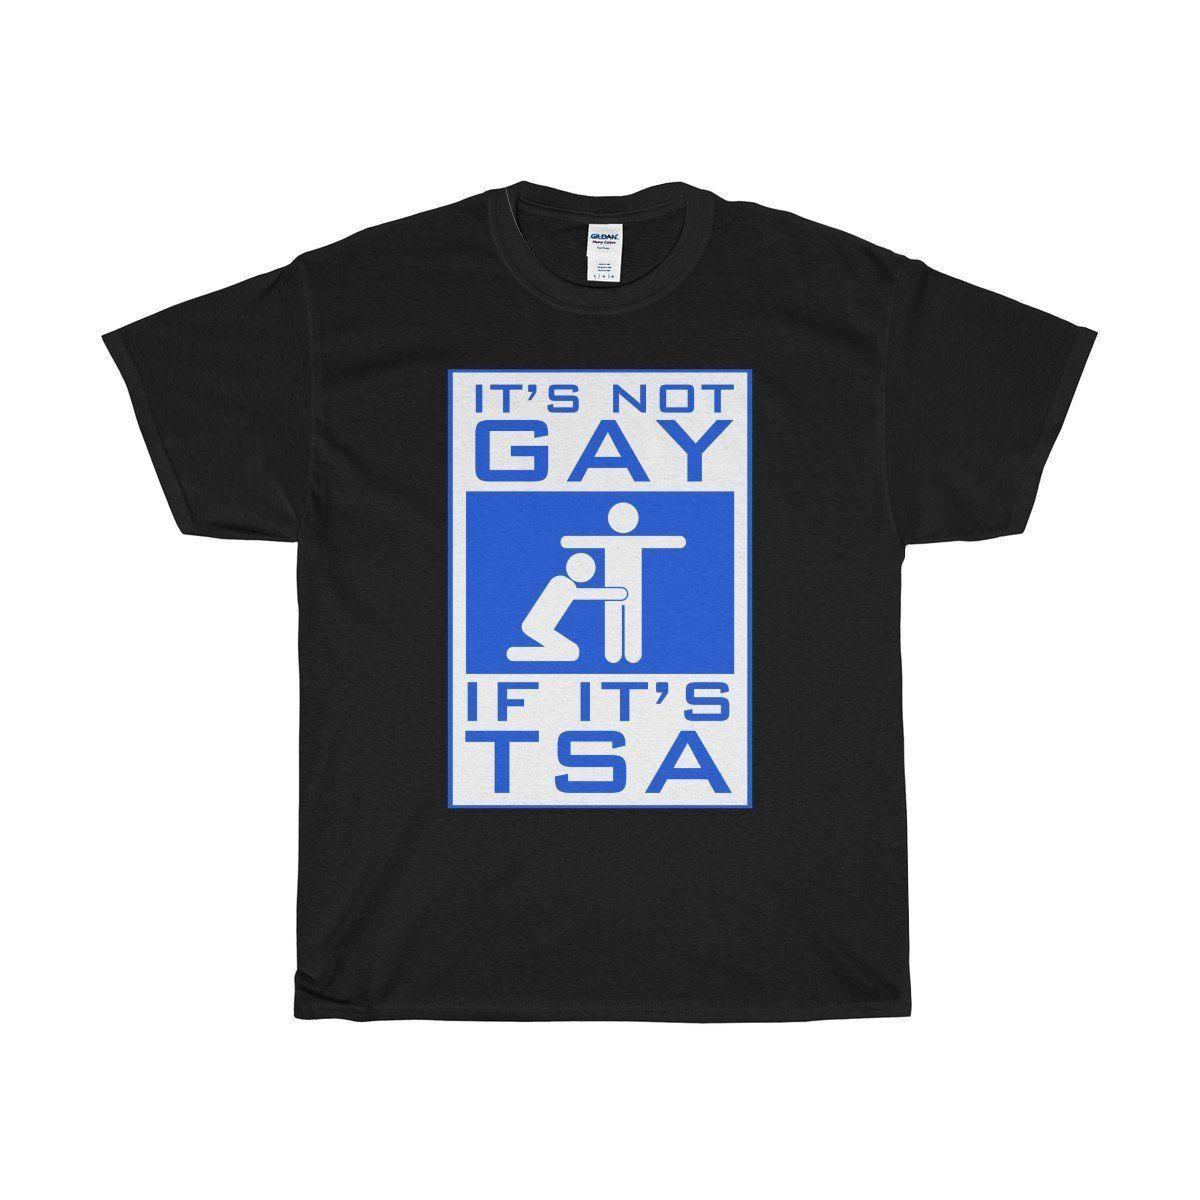 e10a56157 It's not gay if it's TSA funny airport T-Shirt Unisex Heavy Cotton Tee  denim clothes camiseta t shirt